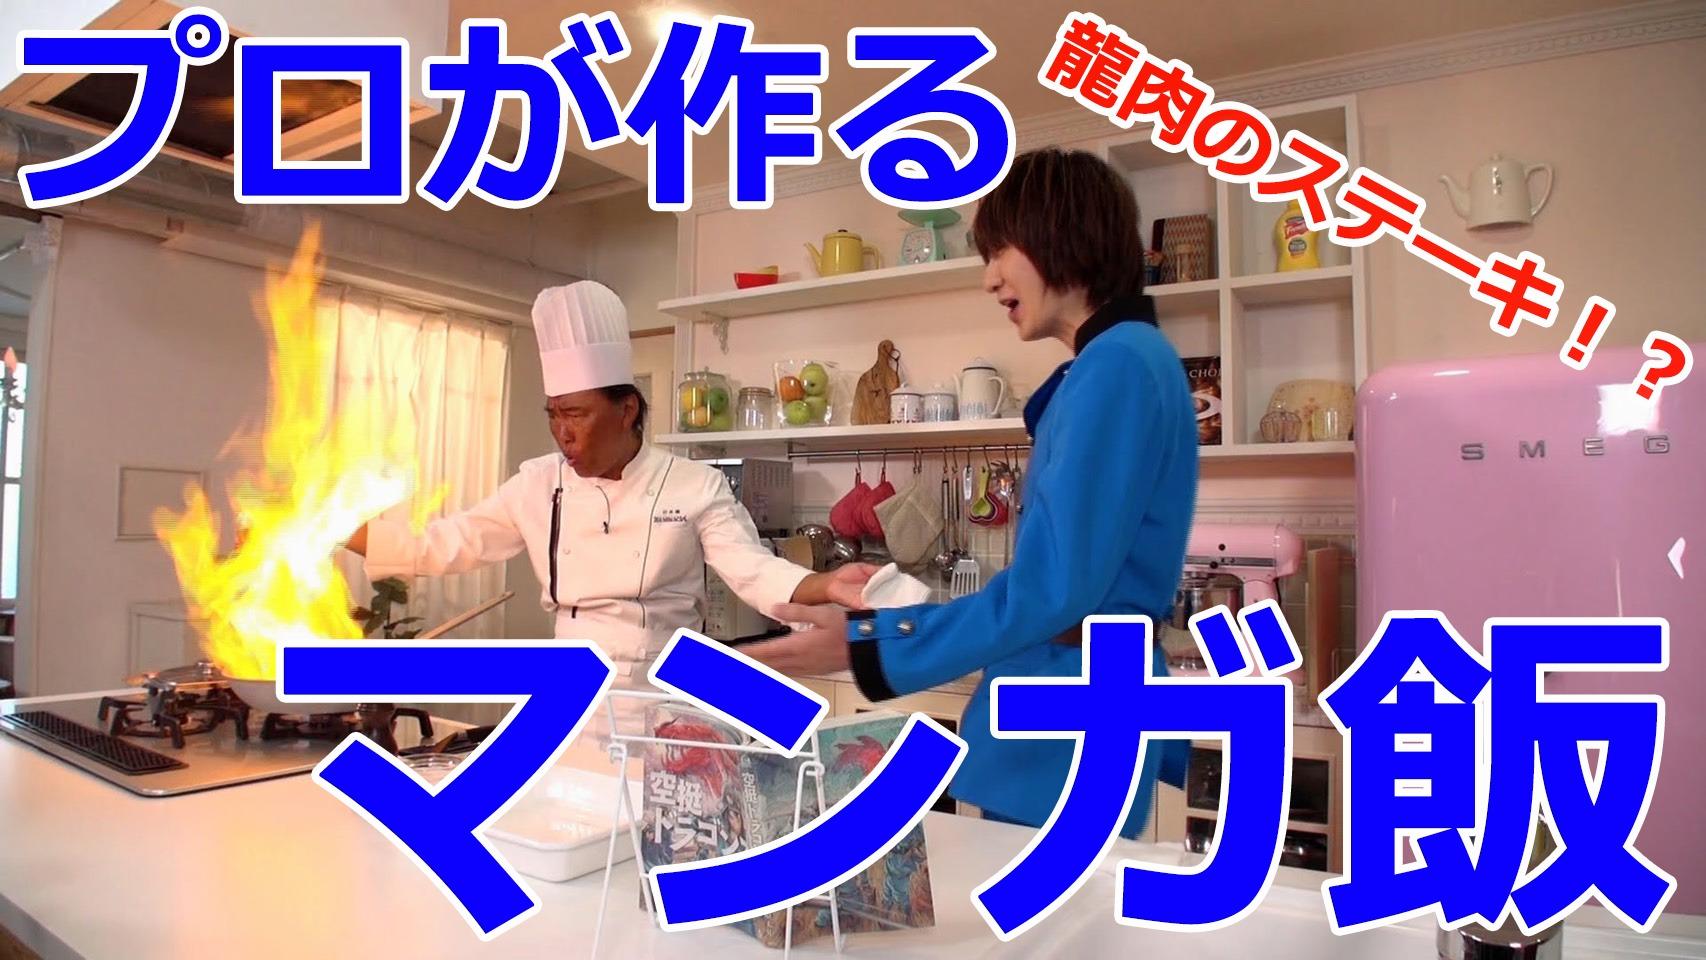 WEB番組『MIKA'Sキッチン』 (c)桑原太矩・講談社/空挺ドラゴンズ製作委員会